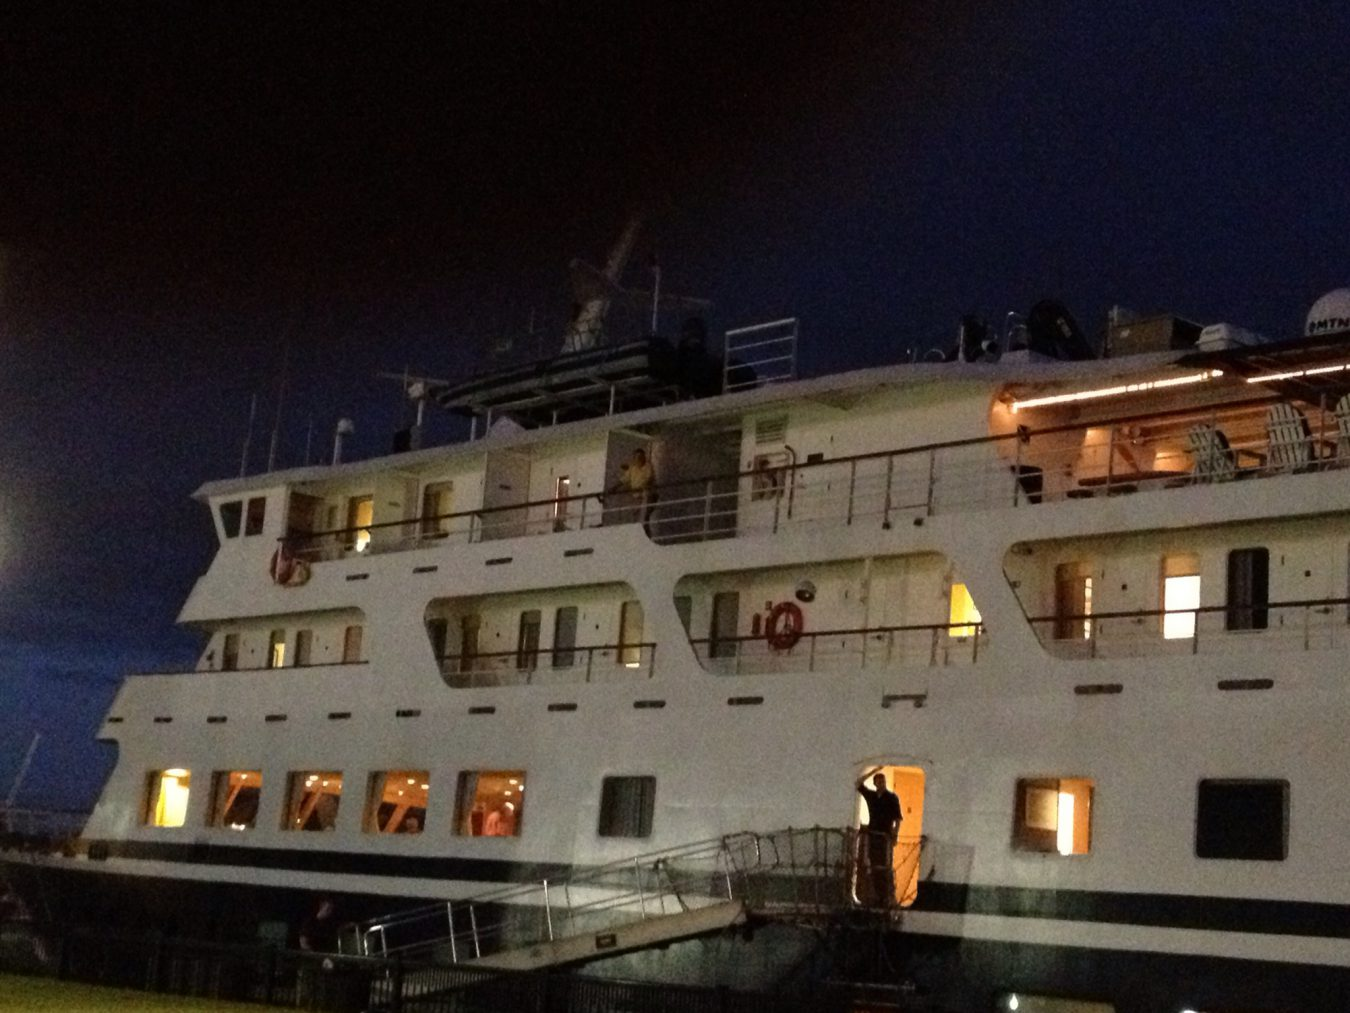 Cruise Ship Yorktown Best Cruise - Cruise ship yorktown